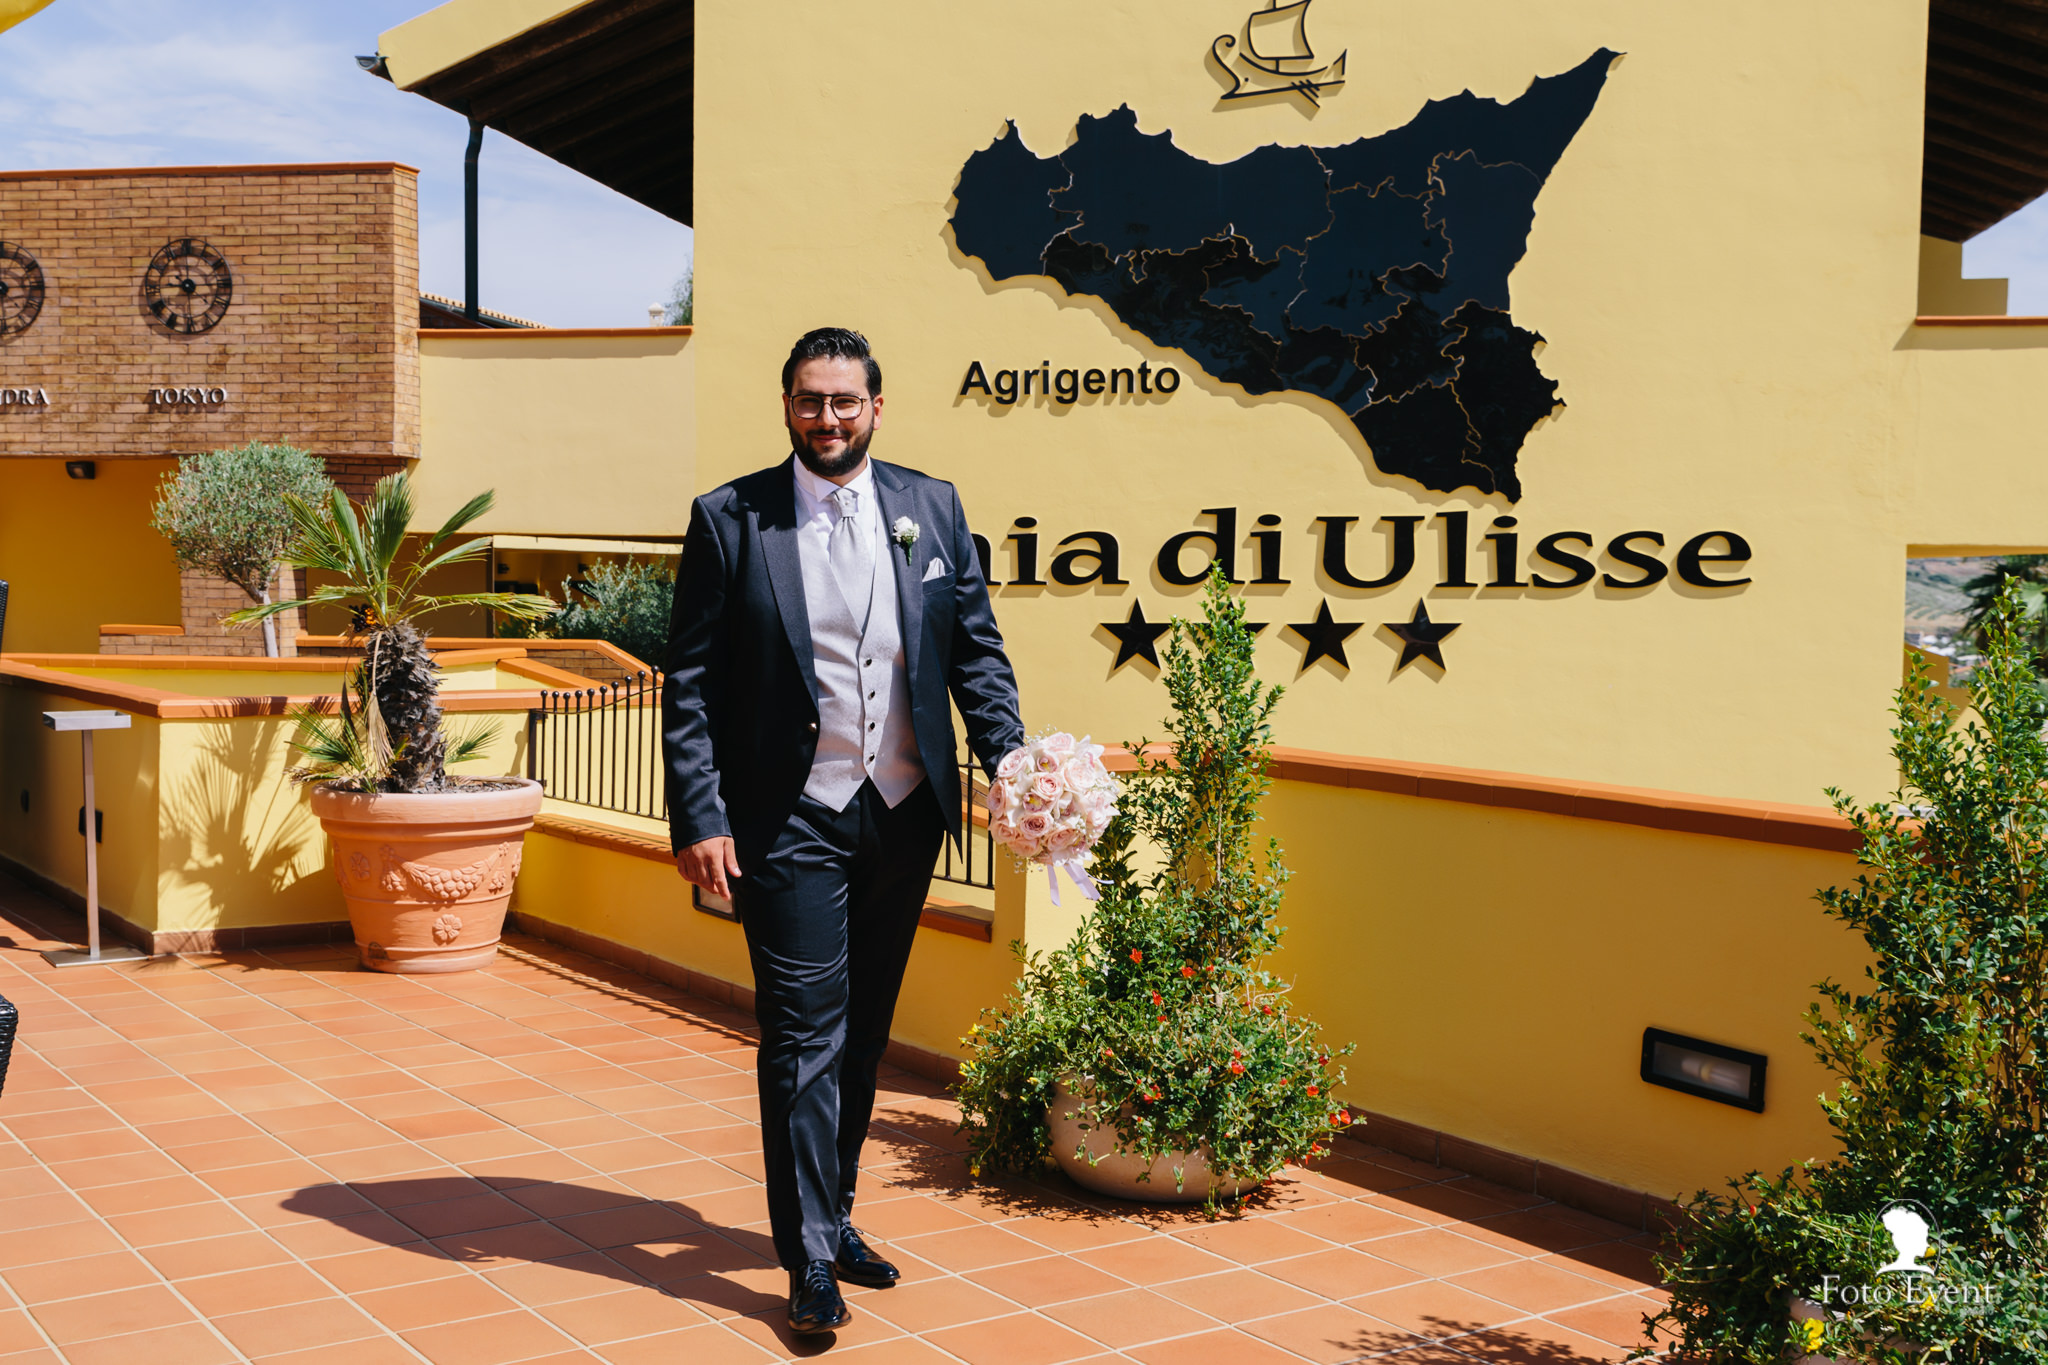 007-2019-09-09-Matrimonio-Dorotea-e-Alberto-Iemmolo-5DN-288